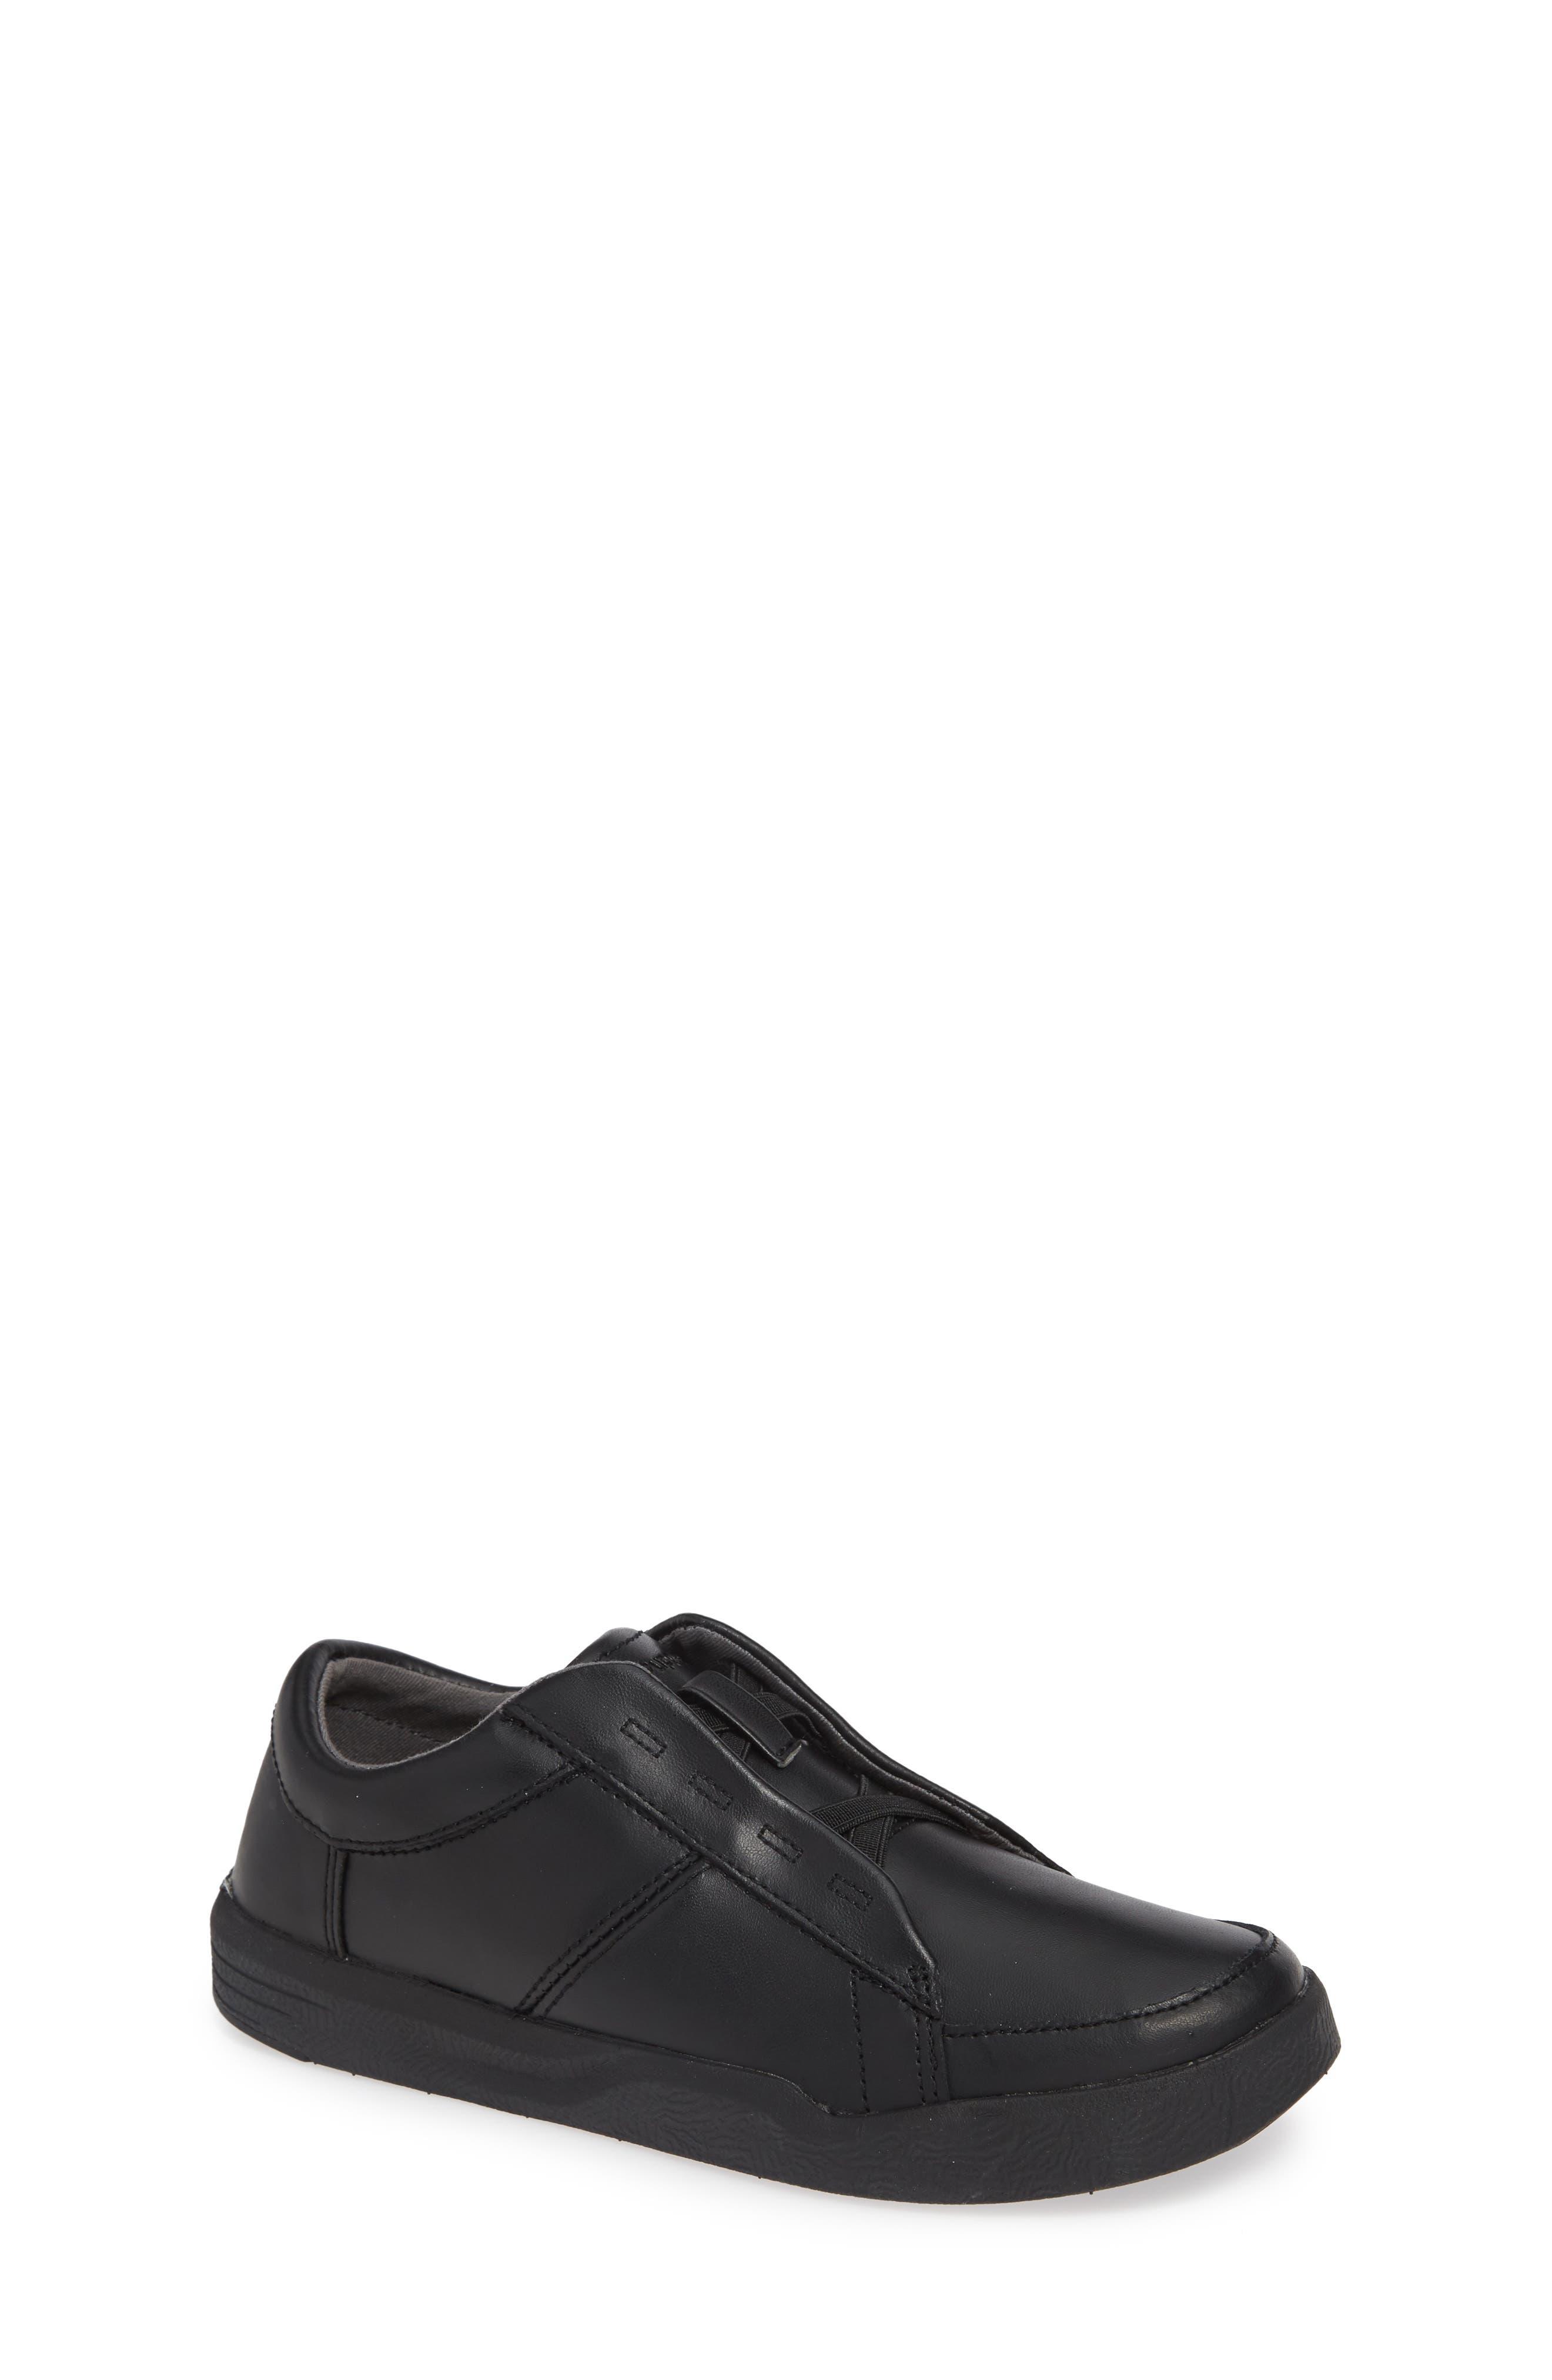 Layden Genius Leather Sneaker,                             Main thumbnail 1, color,                             BLACK/ BLACK